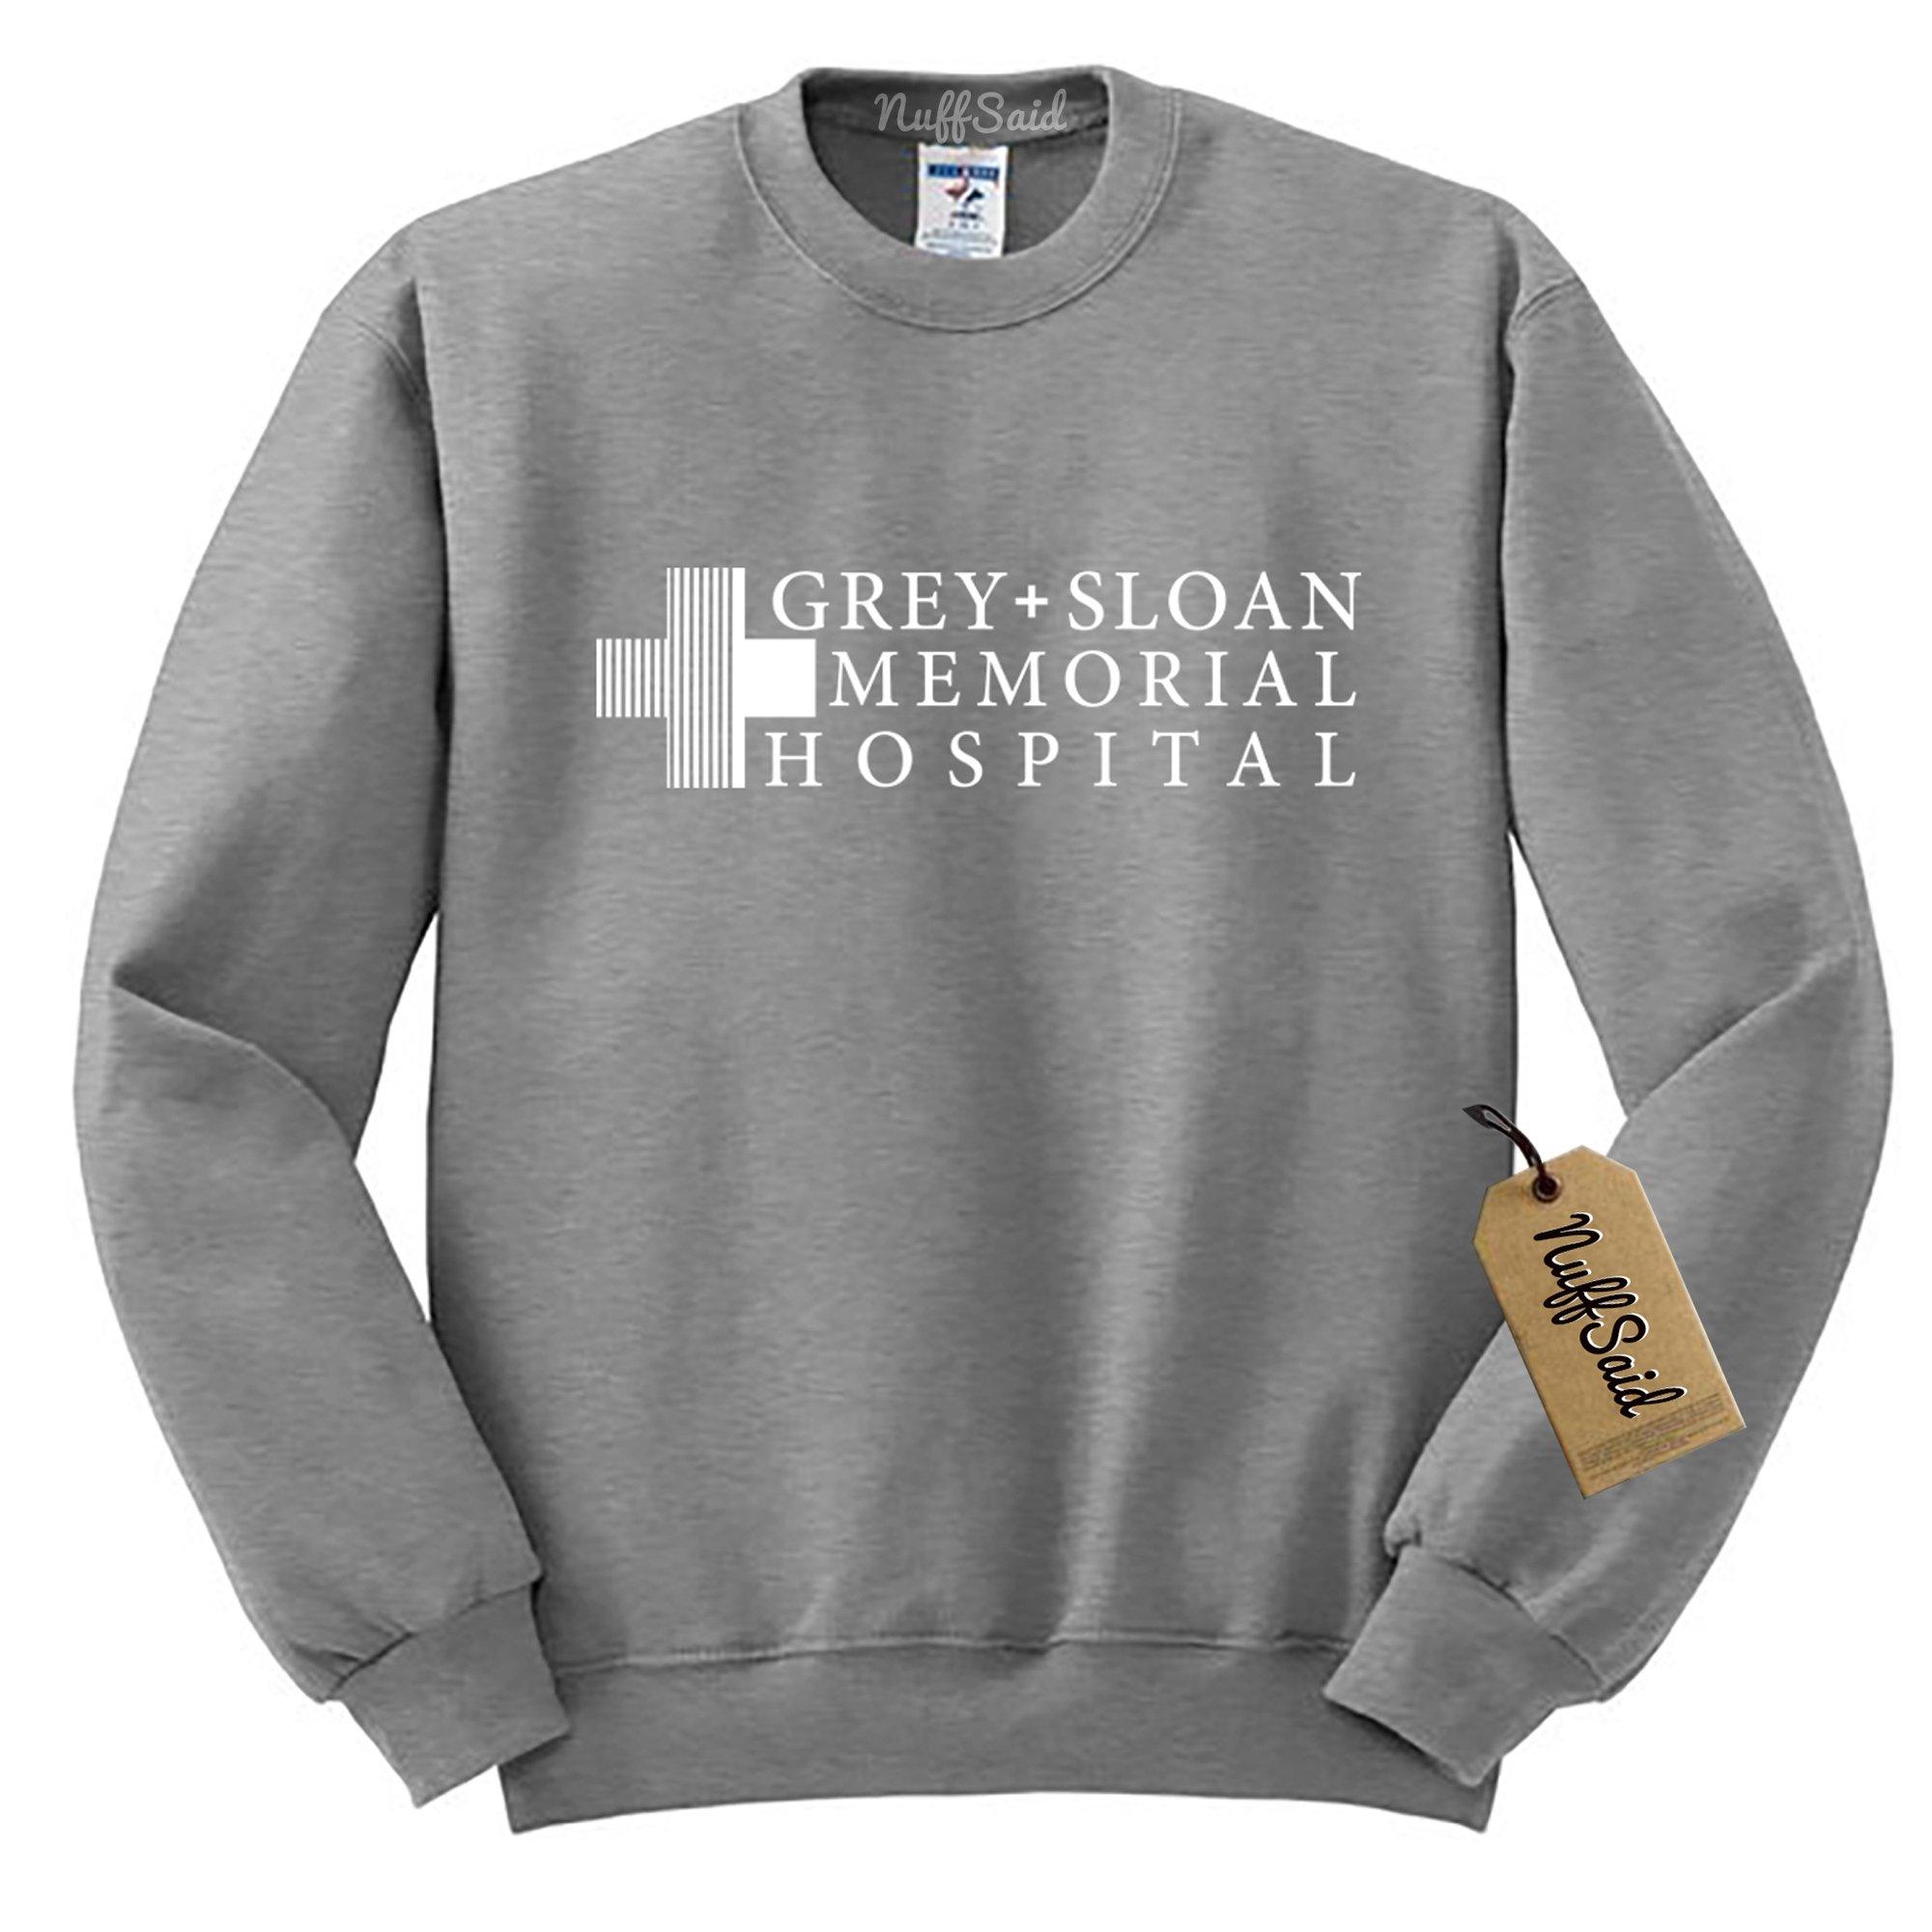 Grey Sloan Memorial Hospital Sweatshirt Sweater Crew Neck Pullover - Premium Quality (Medium, Grey)